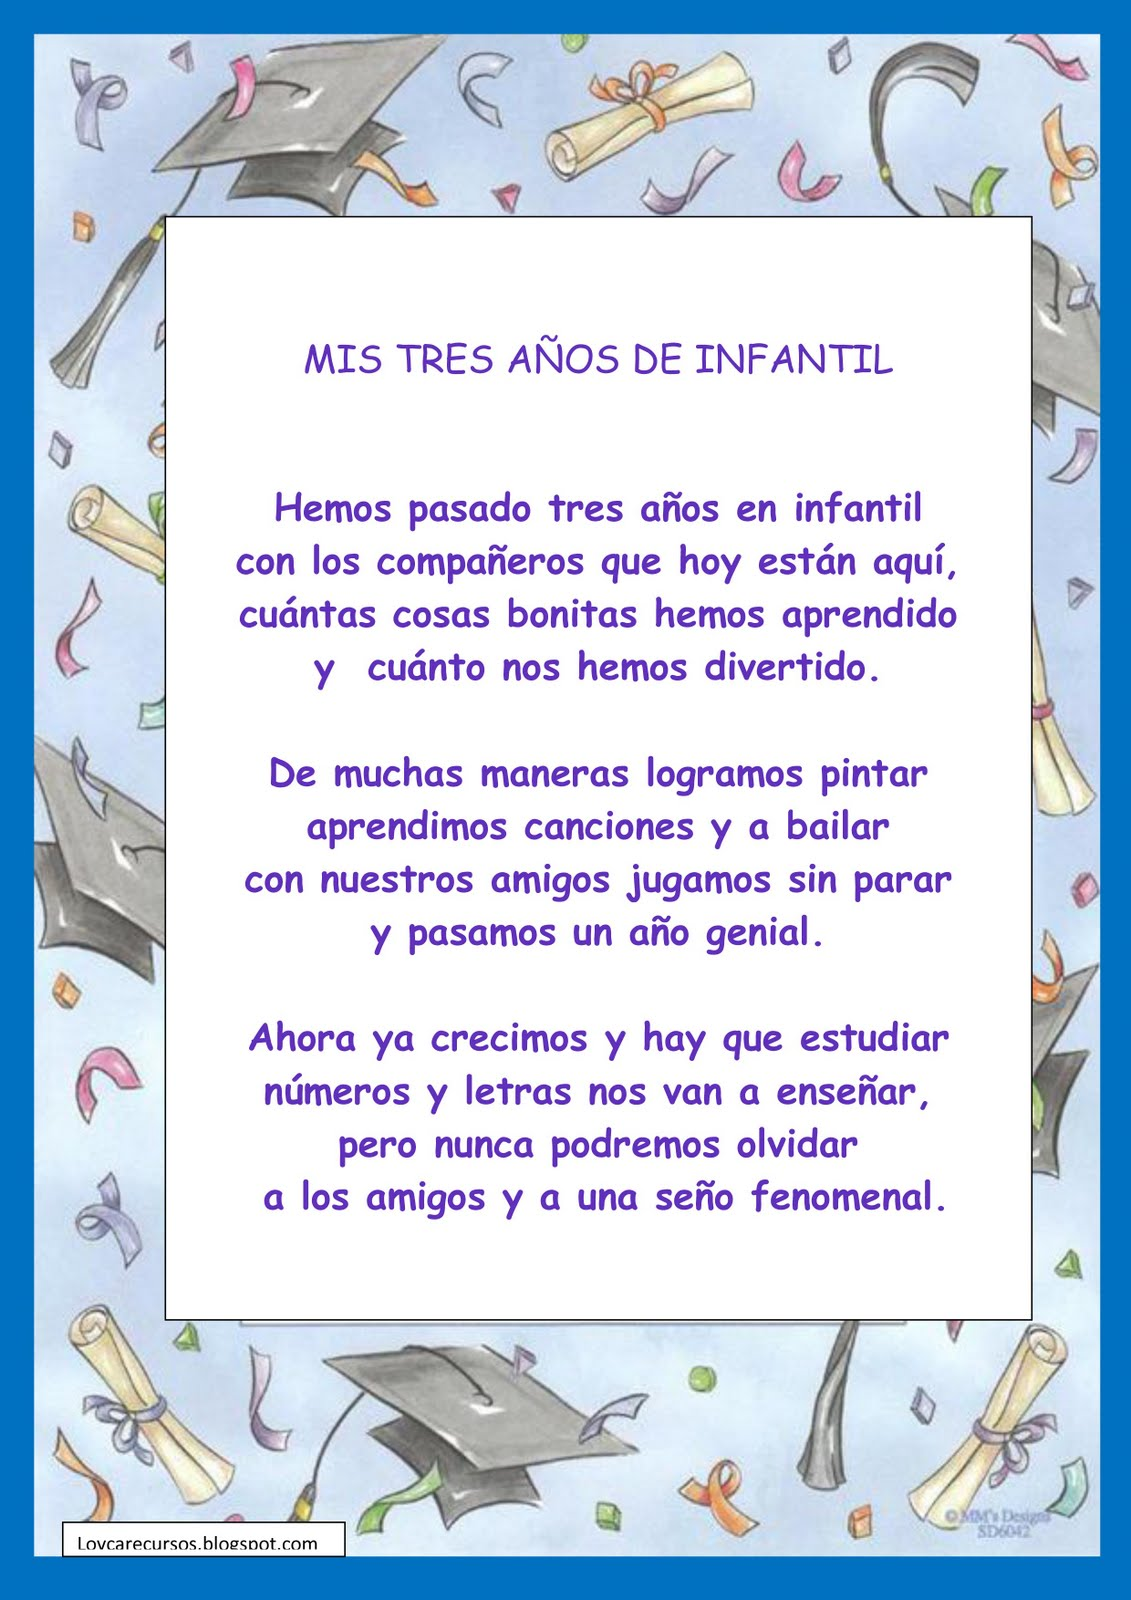 http://3.bp.blogspot.com/_zdASjuyMwuo/TAJNkouseCI/AAAAAAAACh0/c5s0209vwQg/s1600/MIS+TRES+AÃ'OS+EN+EDUCACION+INFANTIL.jpg